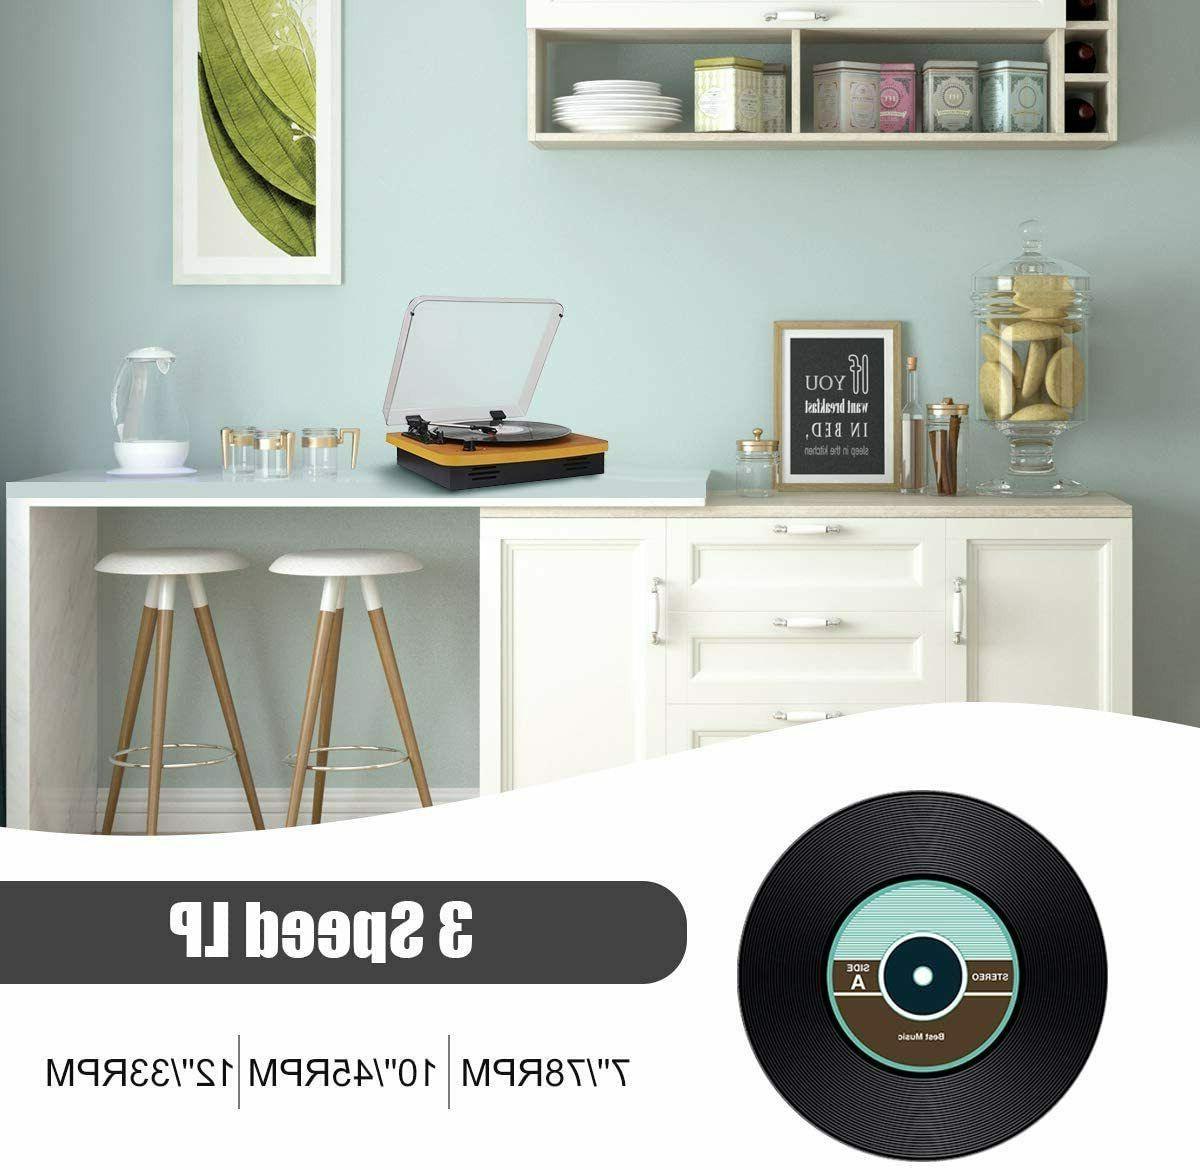 Record Player, Musitrend /Jorlai 3-Speed Stereo